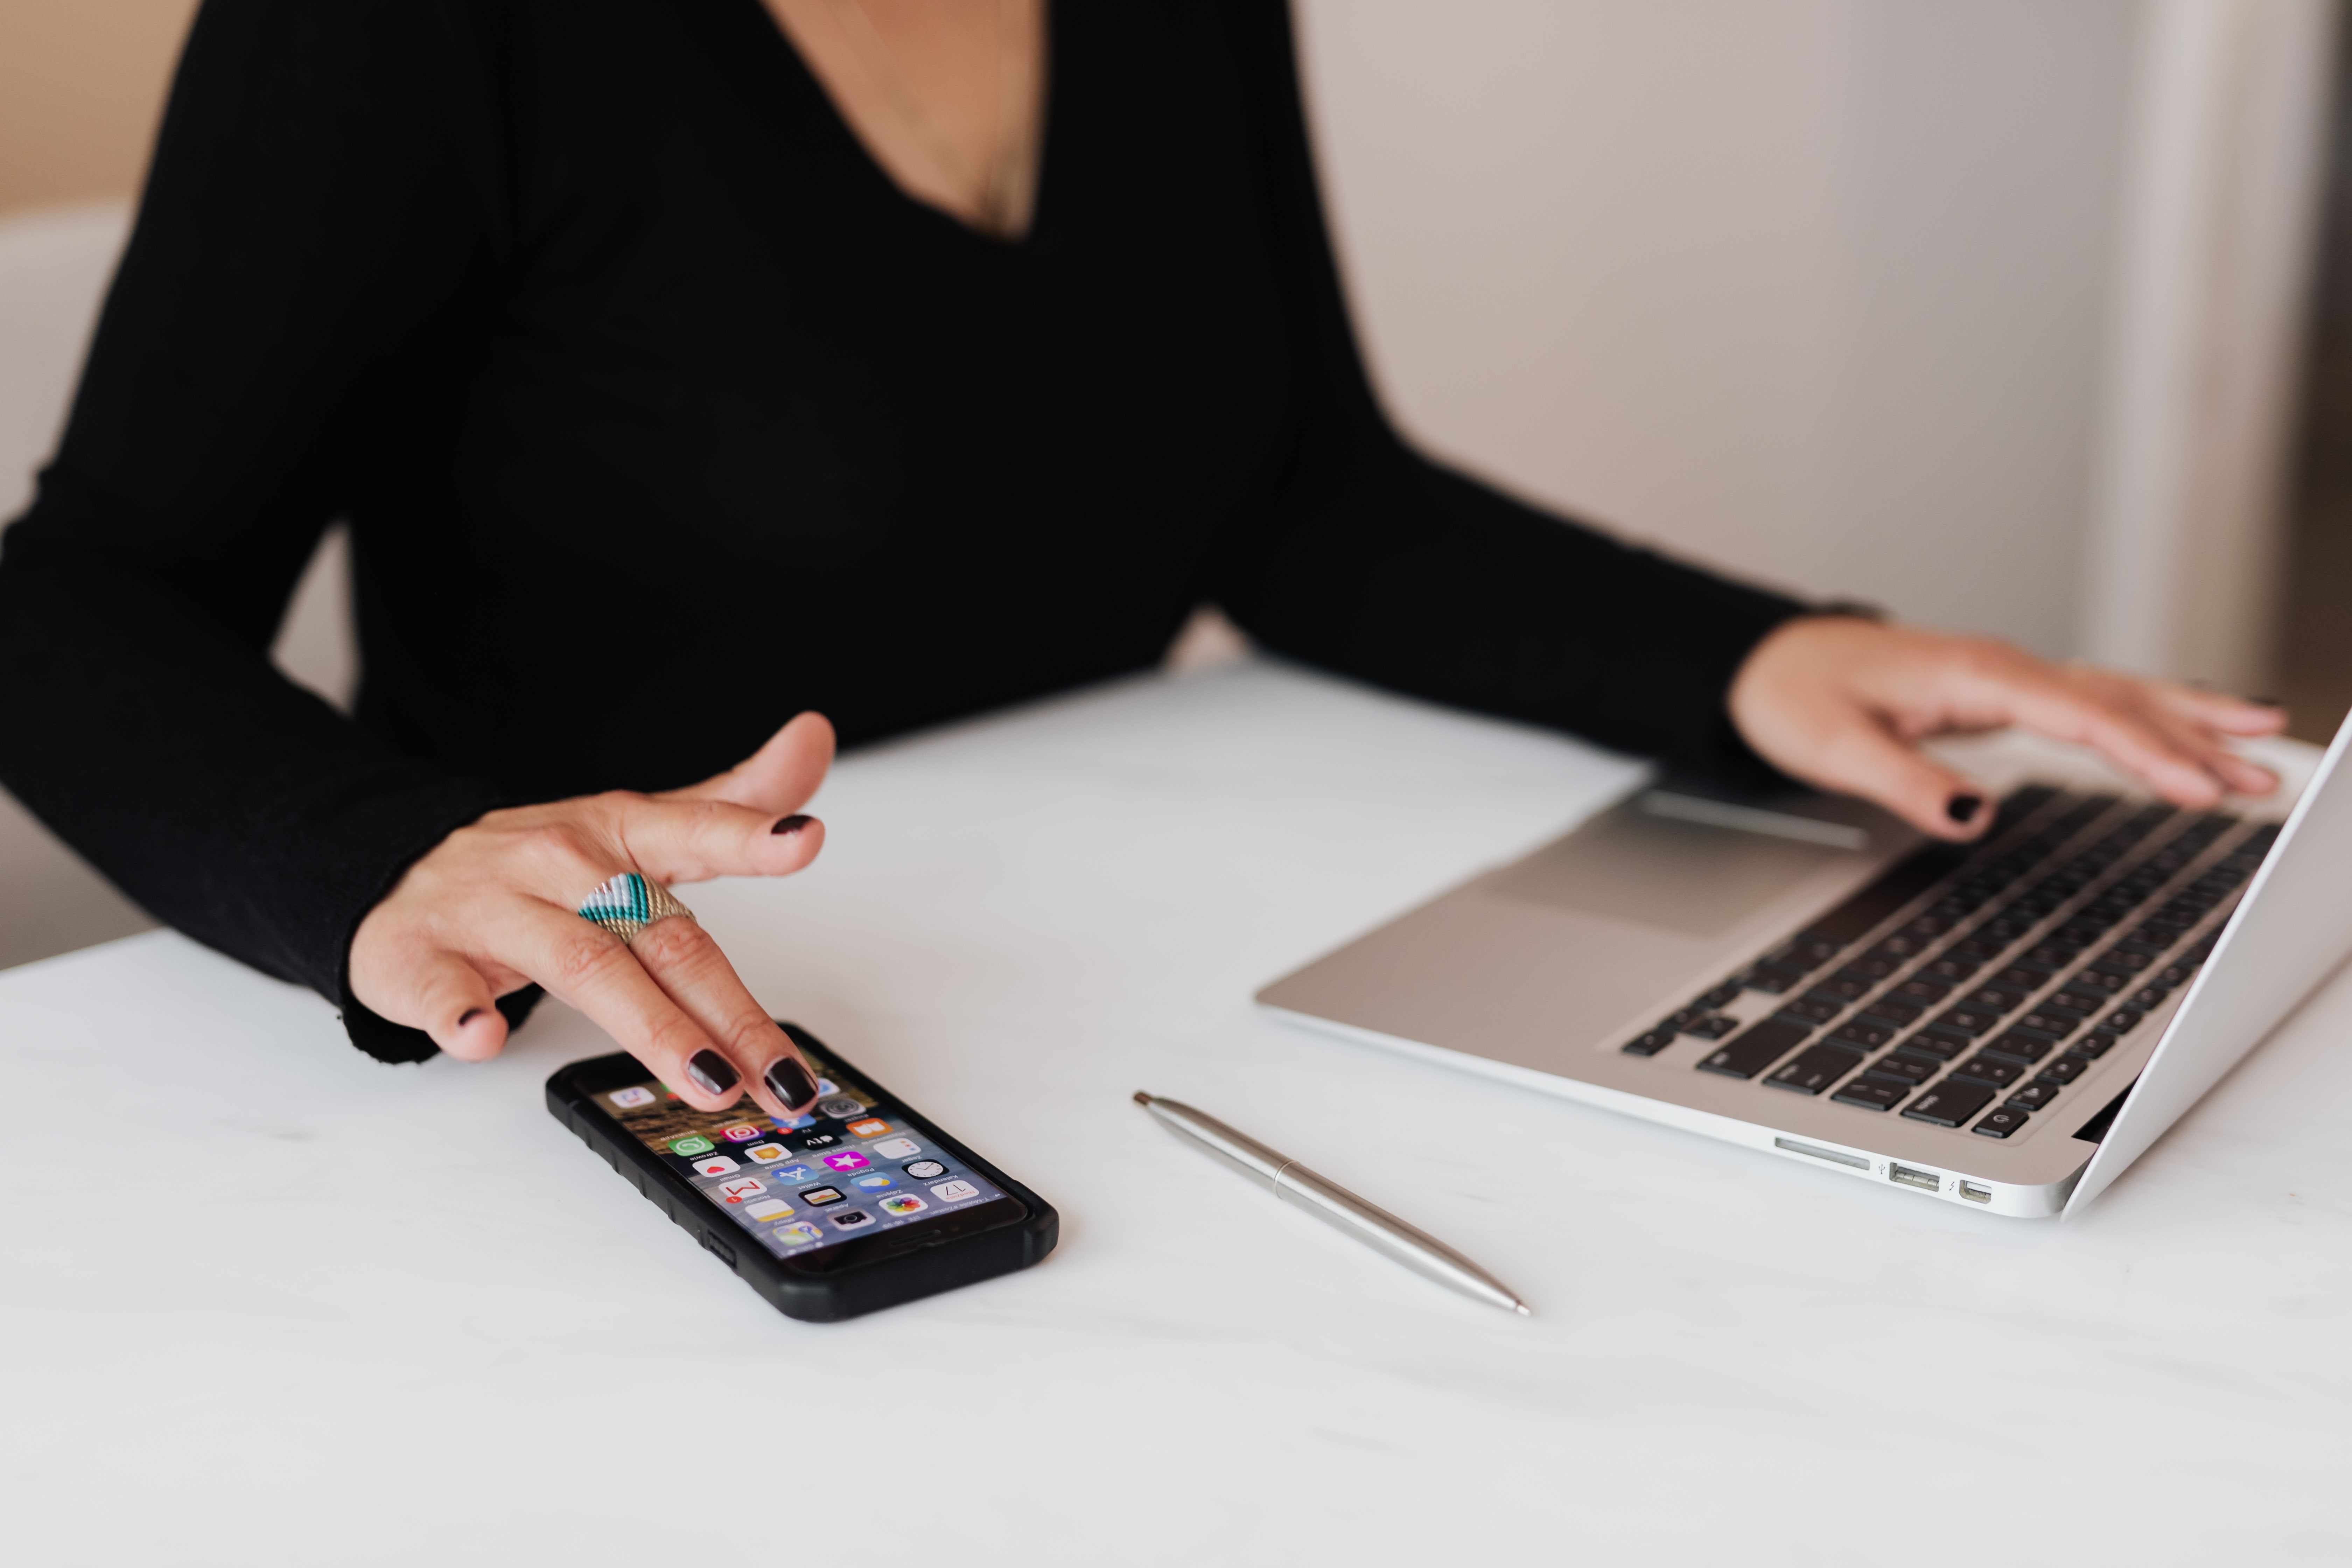 Why should organisations bring back the mindset of single-tasking?